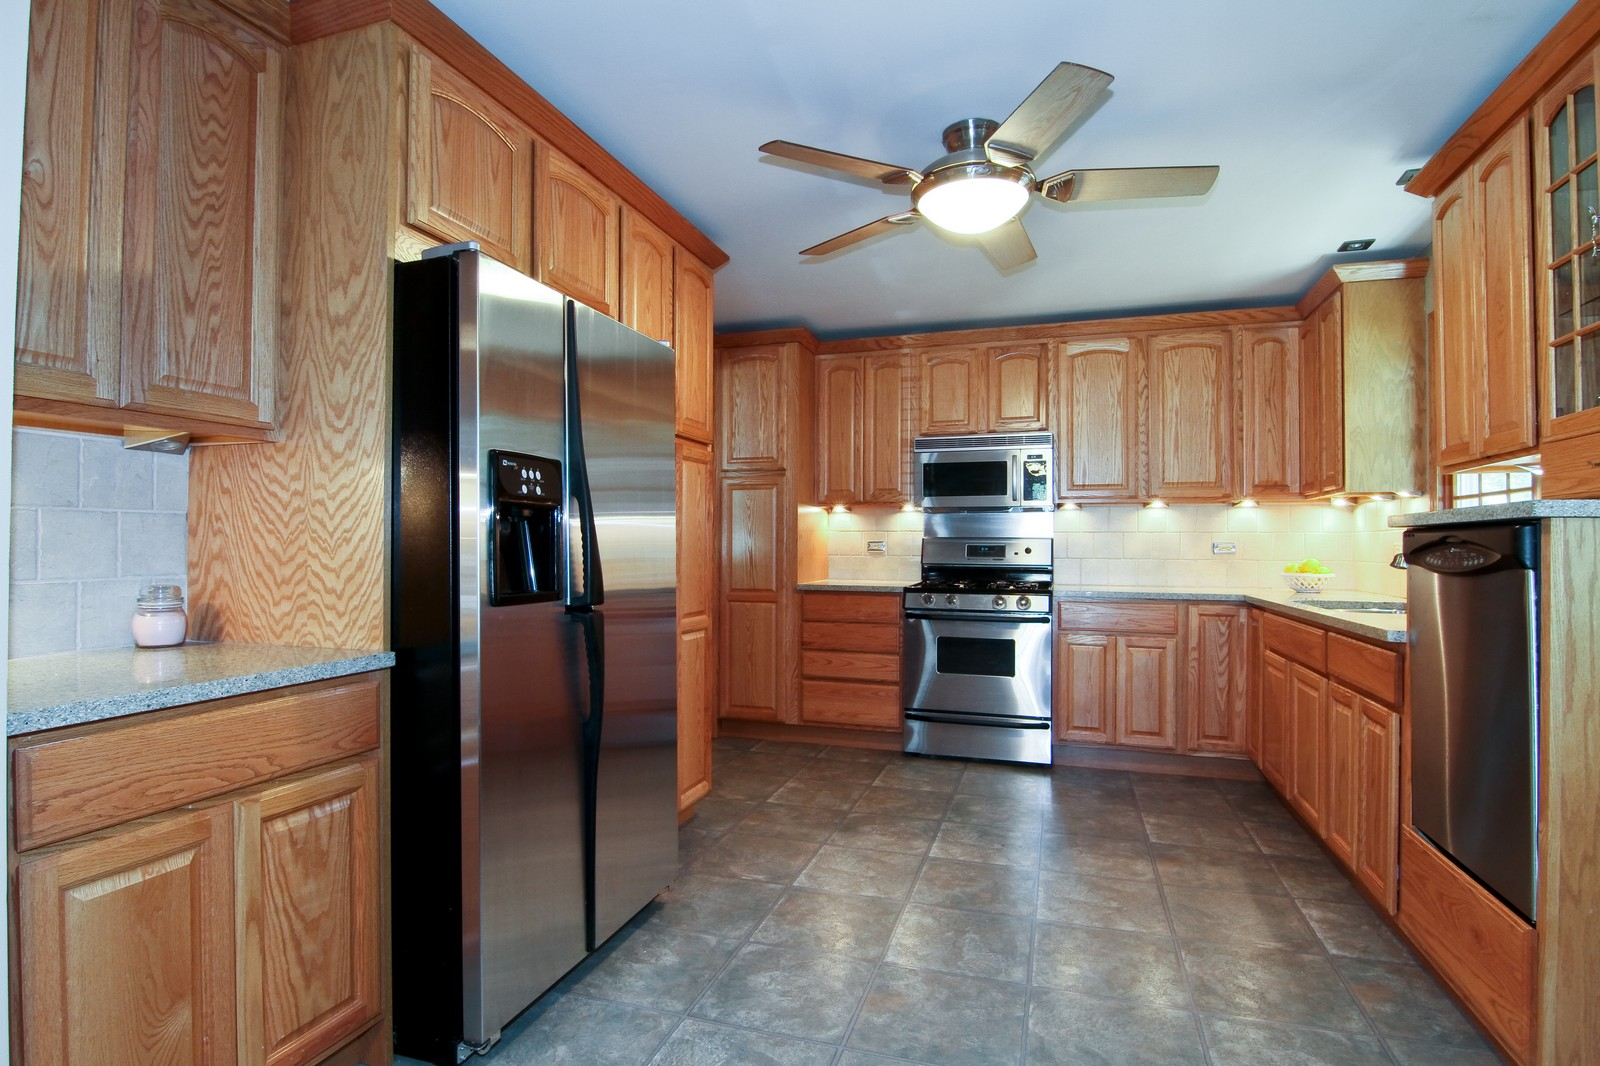 Real Estate Photography - 89 N Ott, Glen Ellyn, IL, 60137 - Kitchen